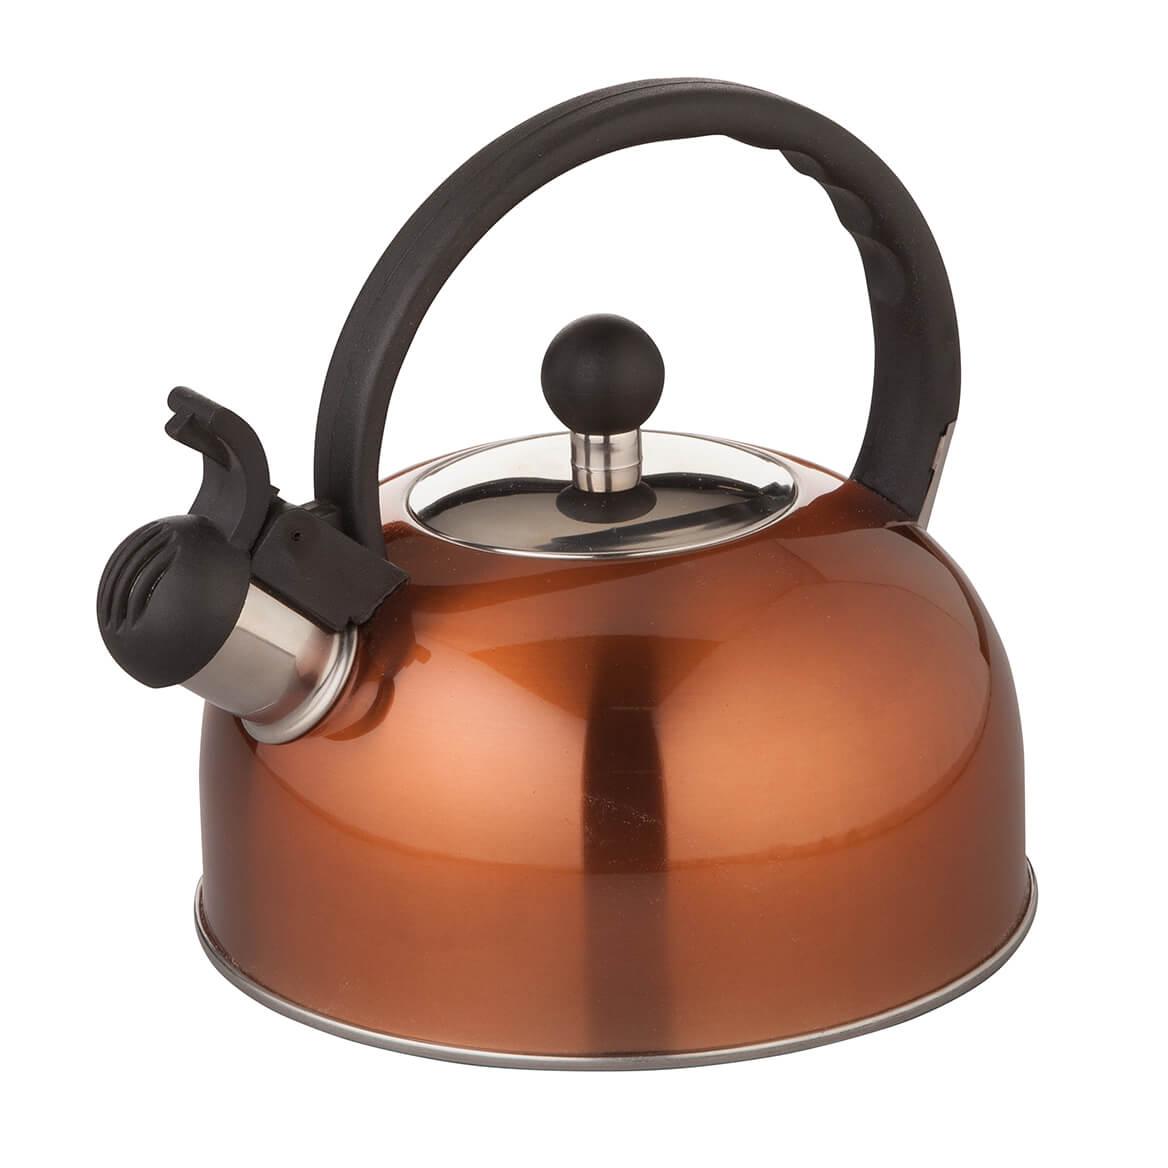 Home Marketplace Copper Color Whistling Tea Kettle-365925